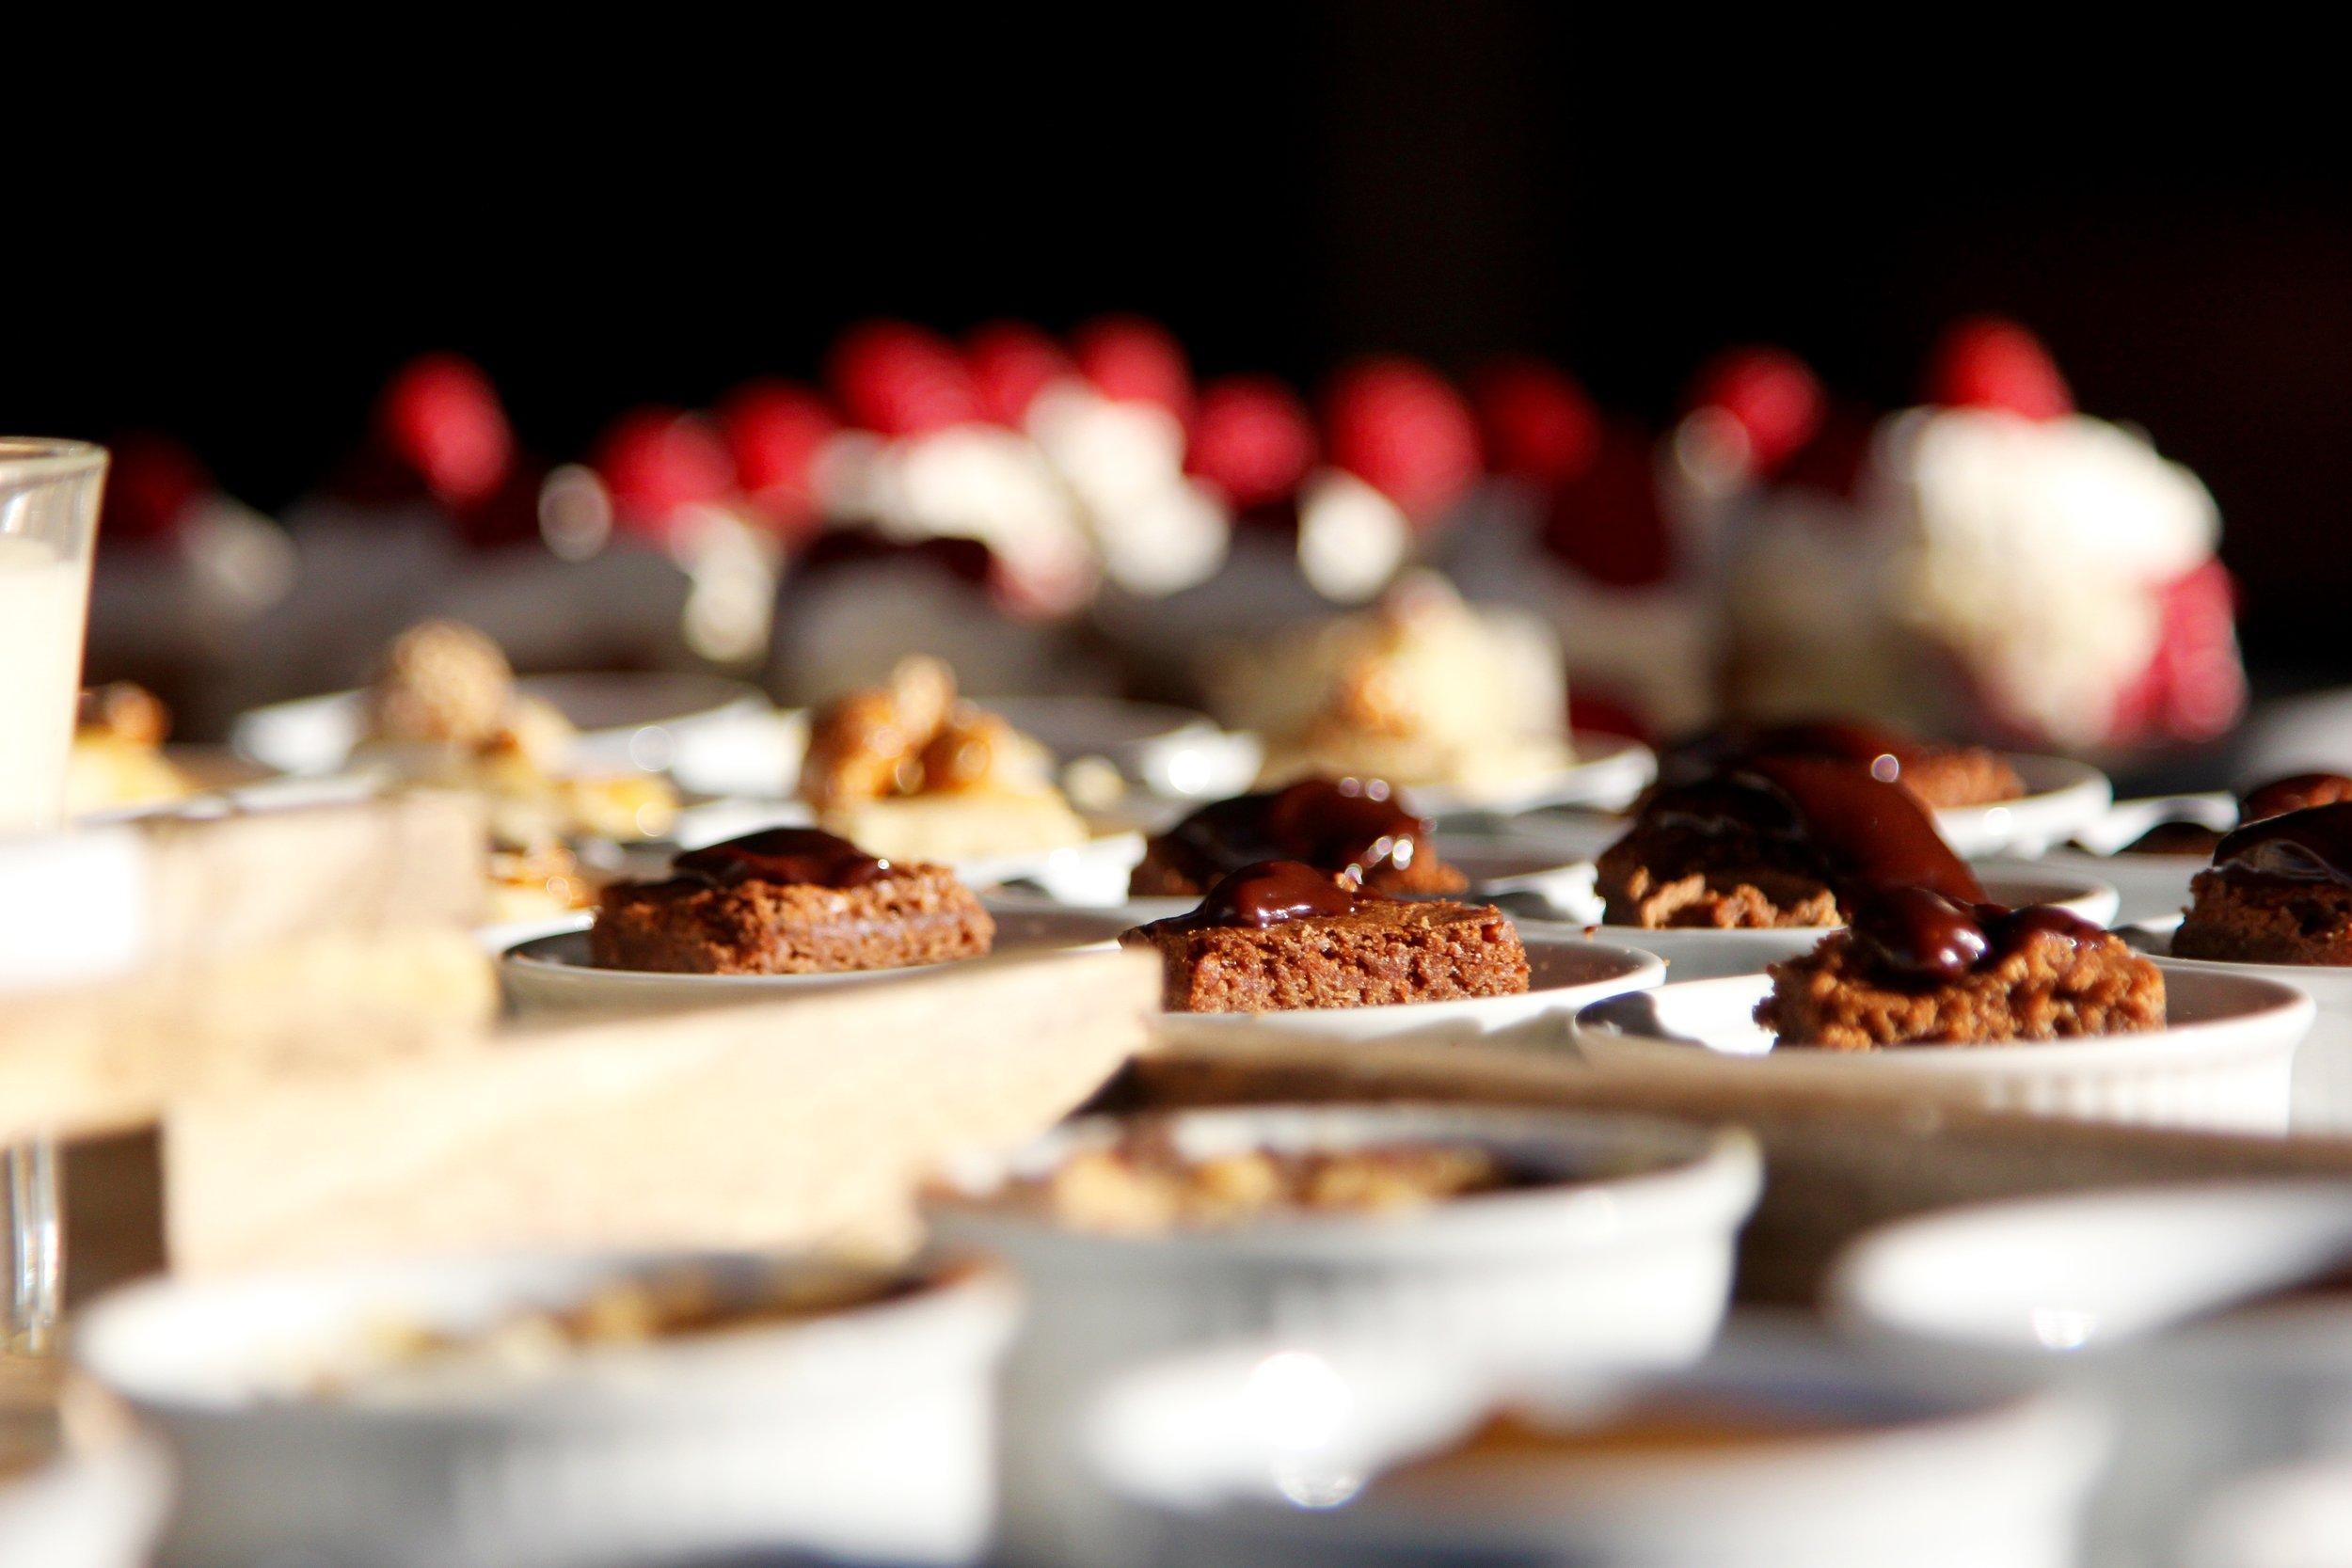 Chocolate brownies with hot chocolate sauce